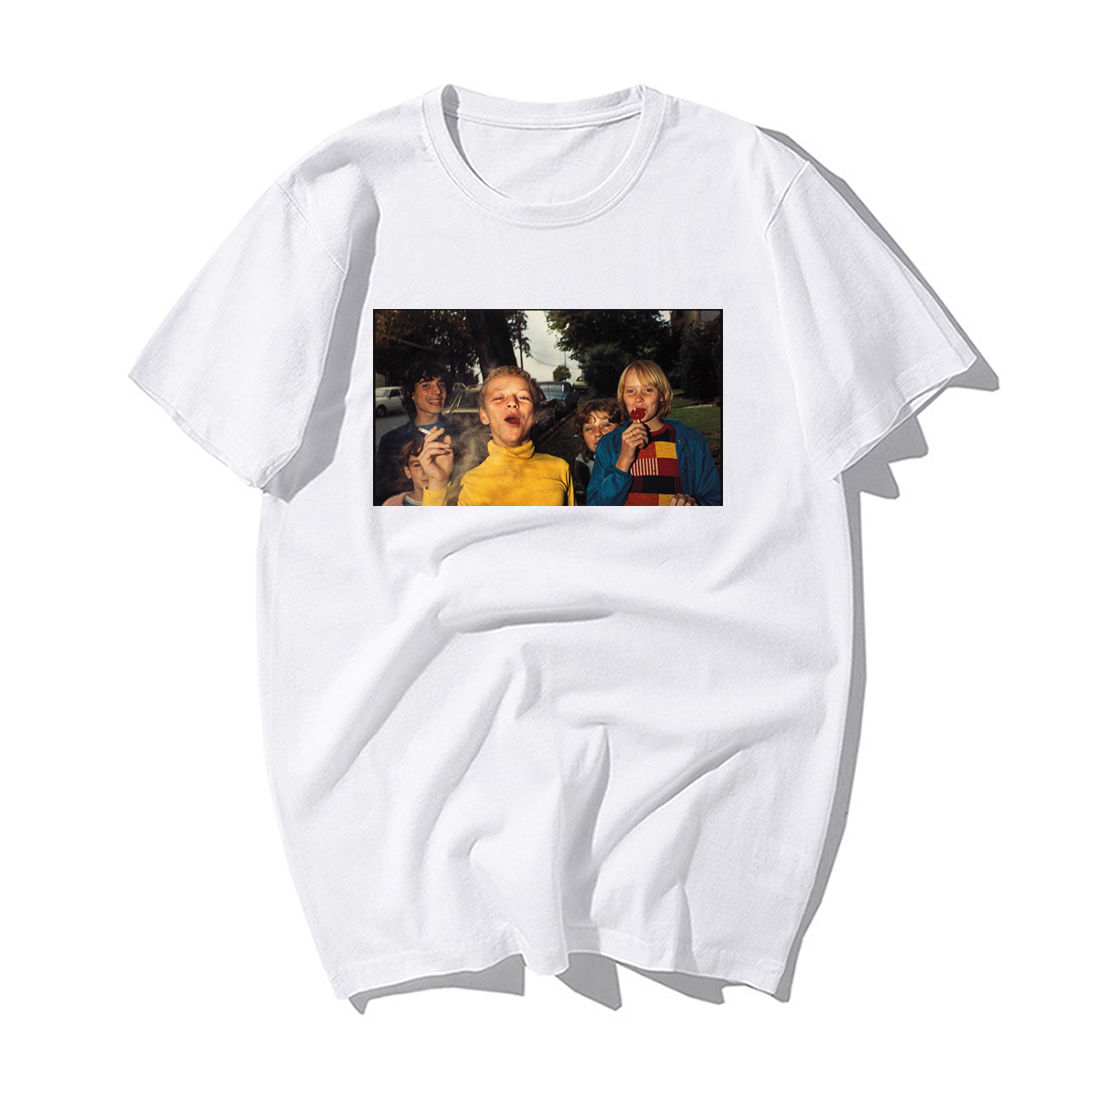 Stay Tuned Men'S Tshirt 2019 Funny Men Print Tshirt Summer Casual High Quality Cotton Short Sleeve T-Shirt Hip Hop Streetwear